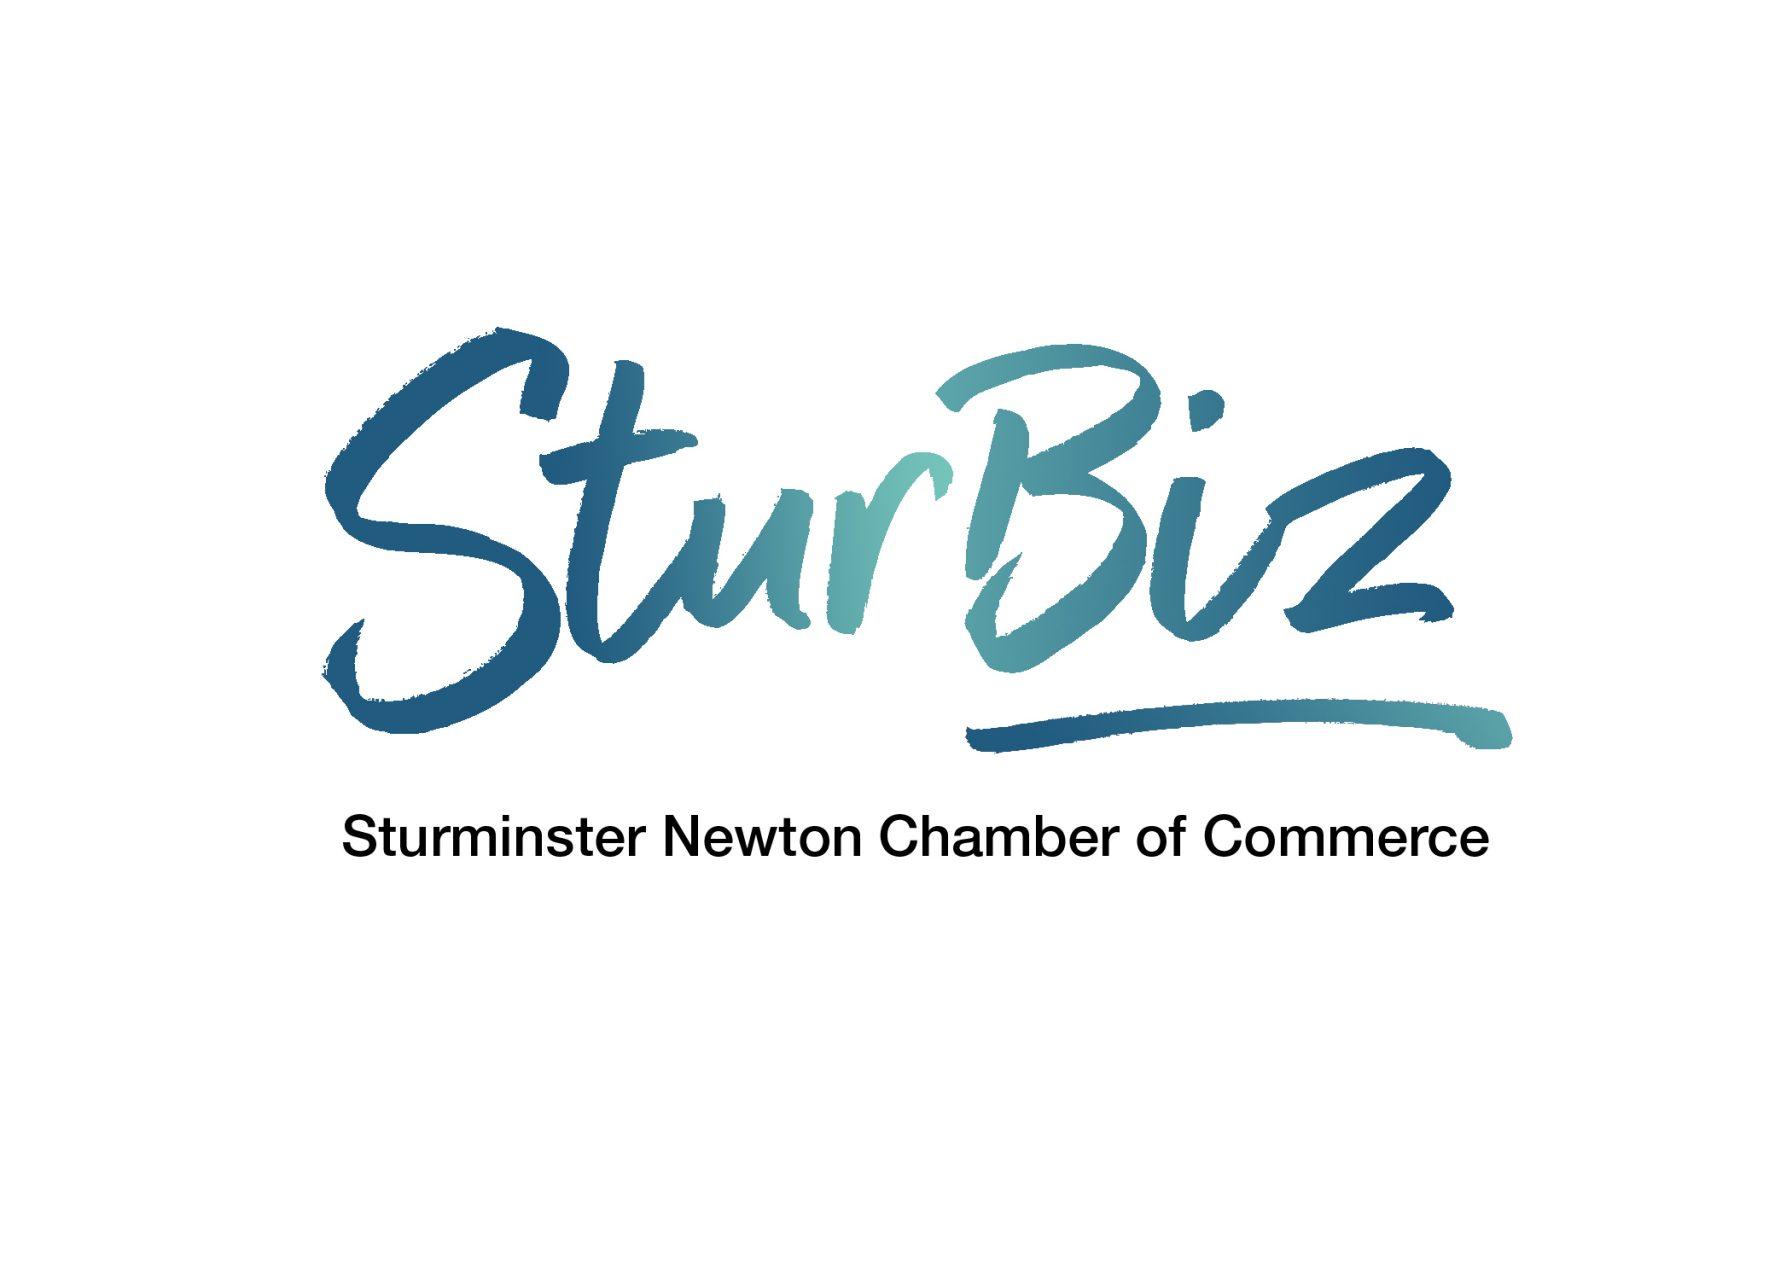 Sturminster Newton-SturBiz